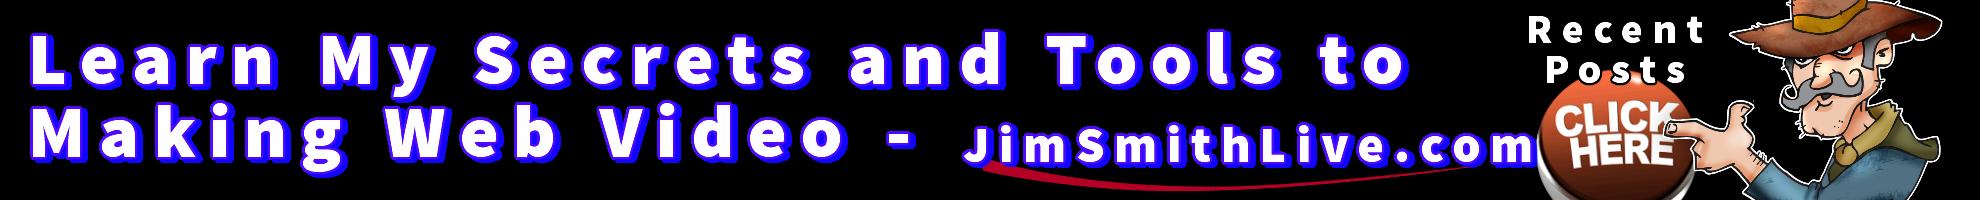 JimSmithLive